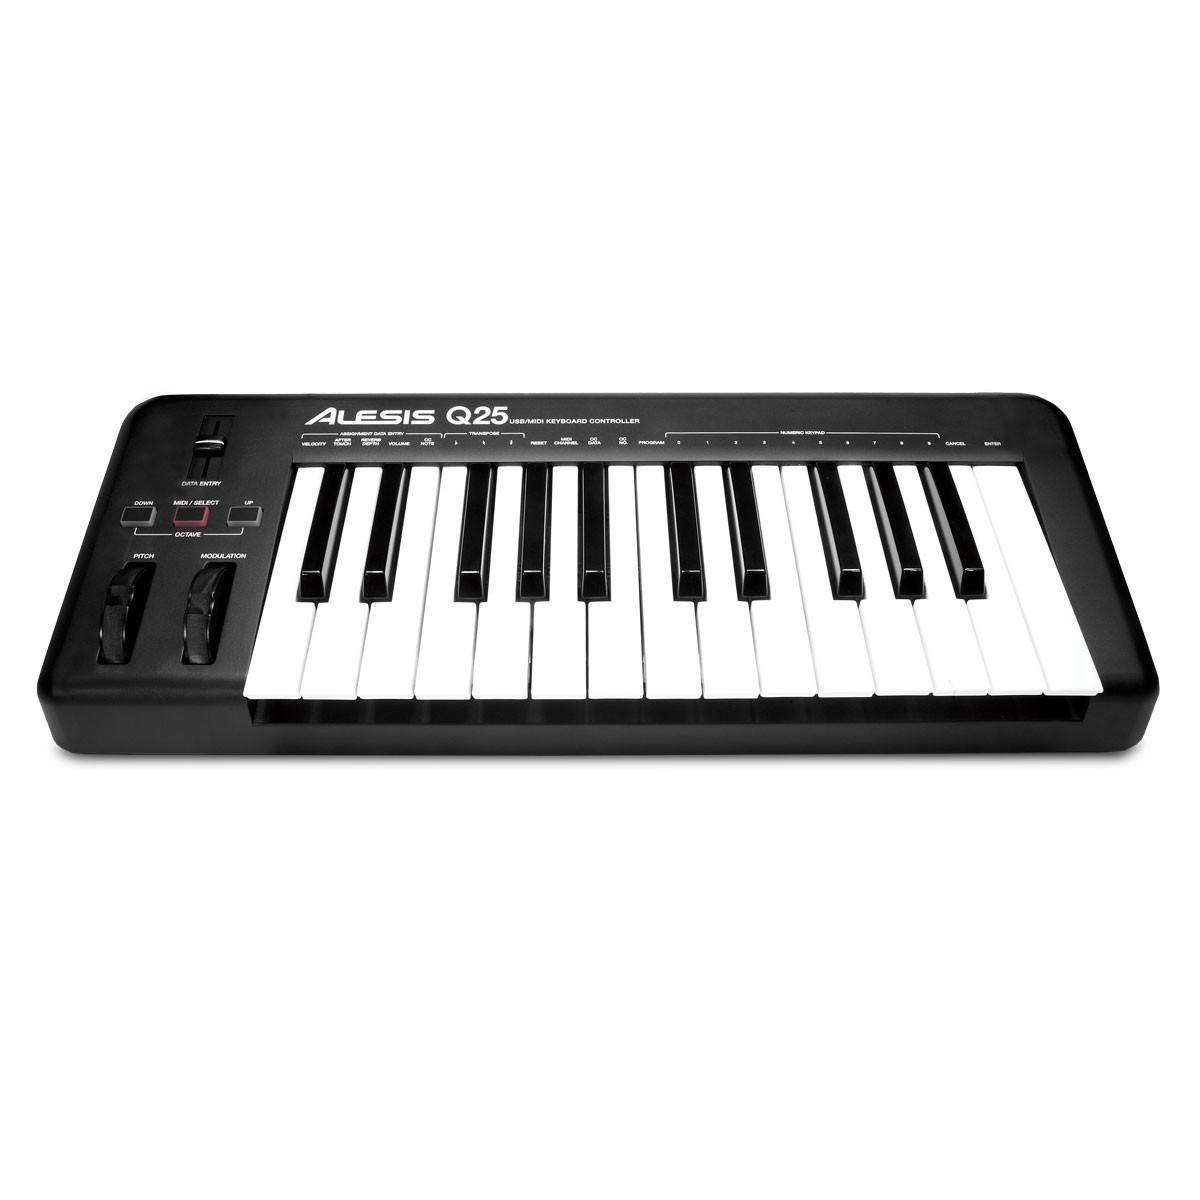 alesis q25 25 key usb midi keyboard at gear4music. Black Bedroom Furniture Sets. Home Design Ideas